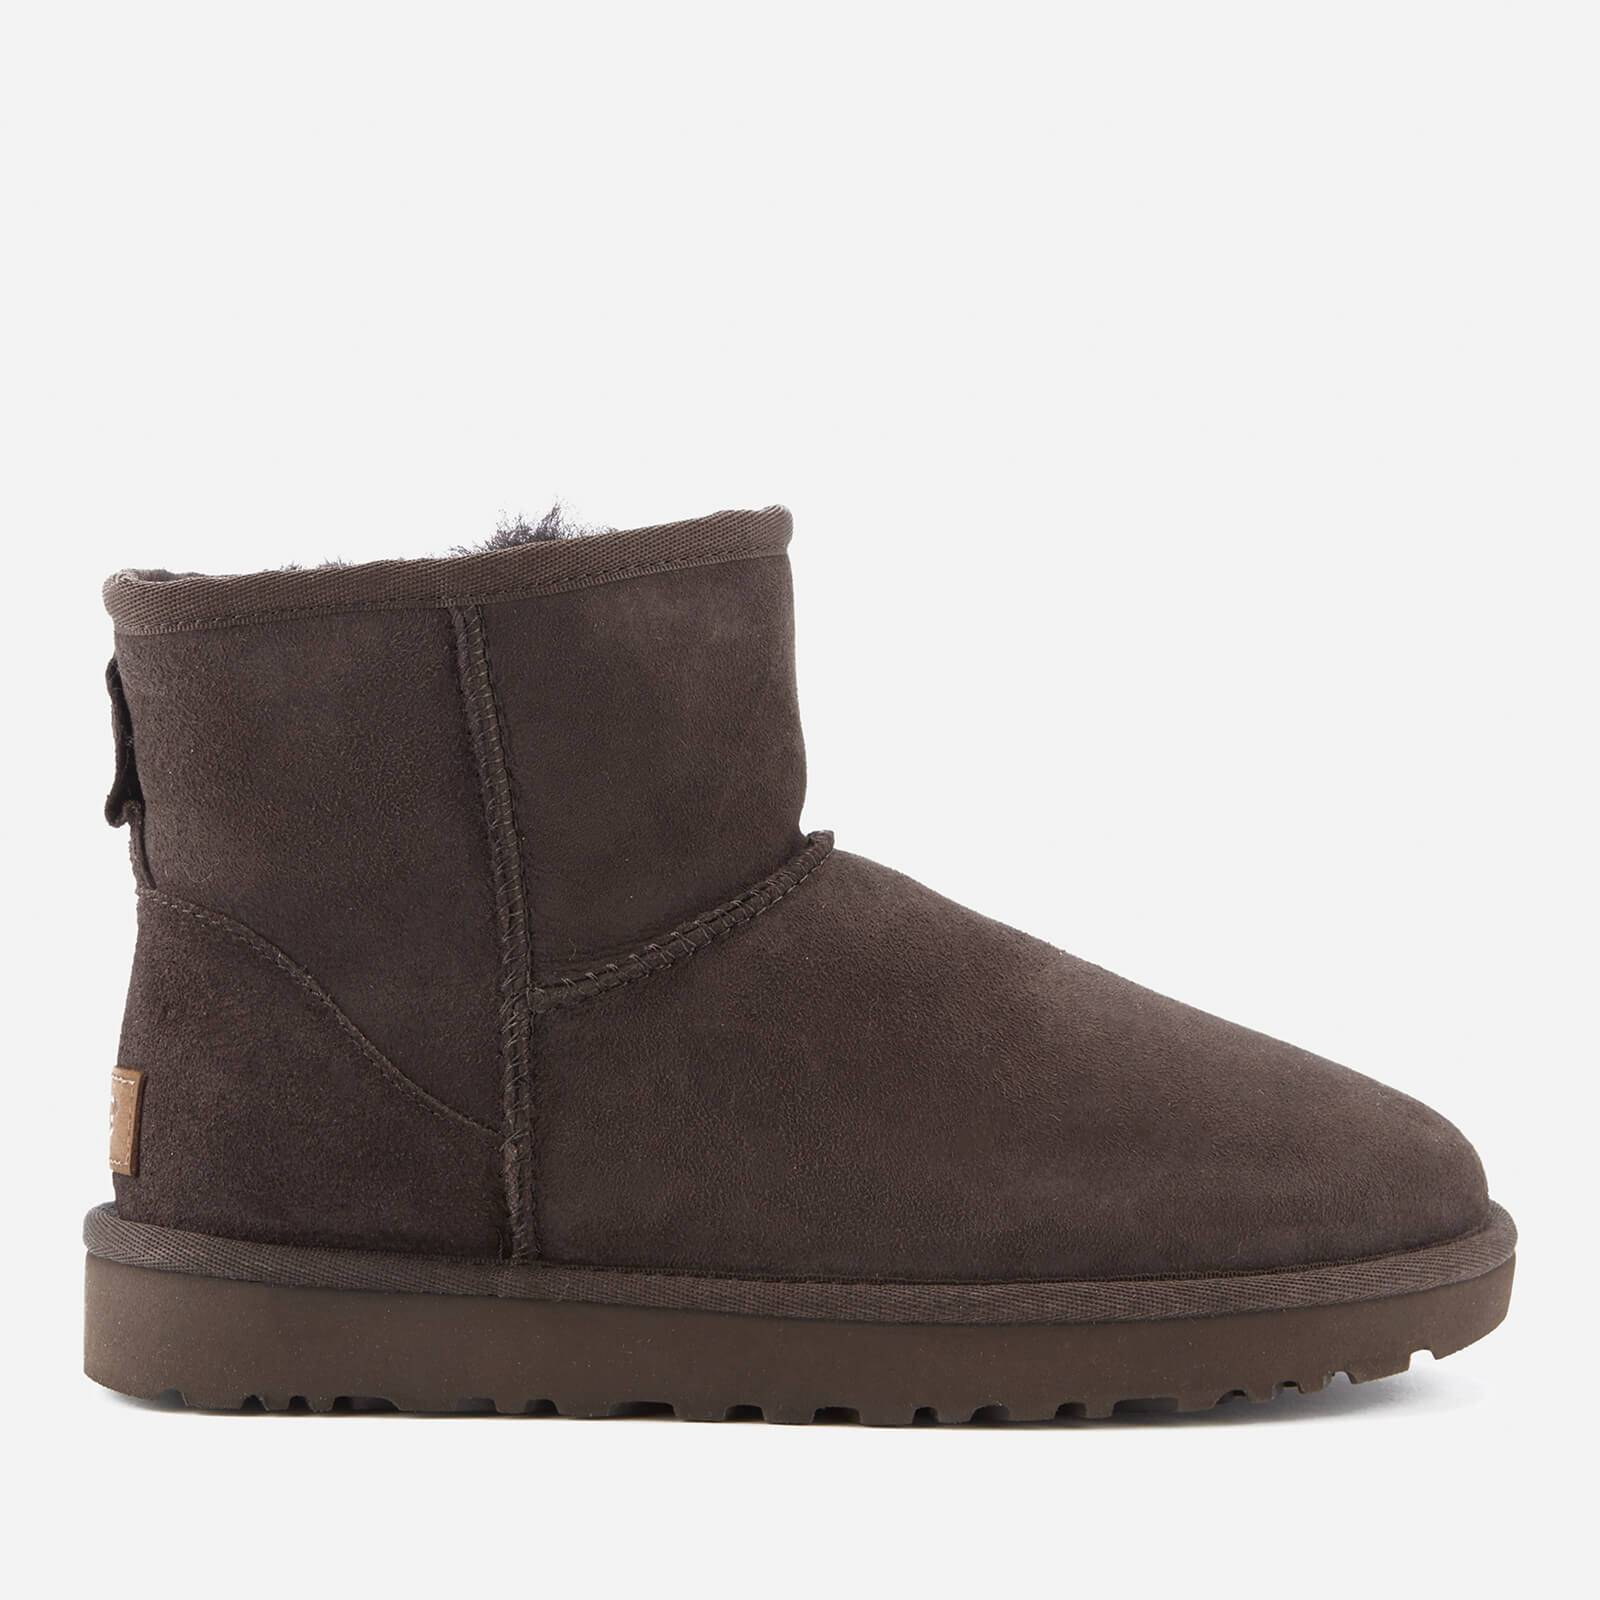 UGG Women's Classic Mini II Sheepskin Boots - Chocolate - UK 4